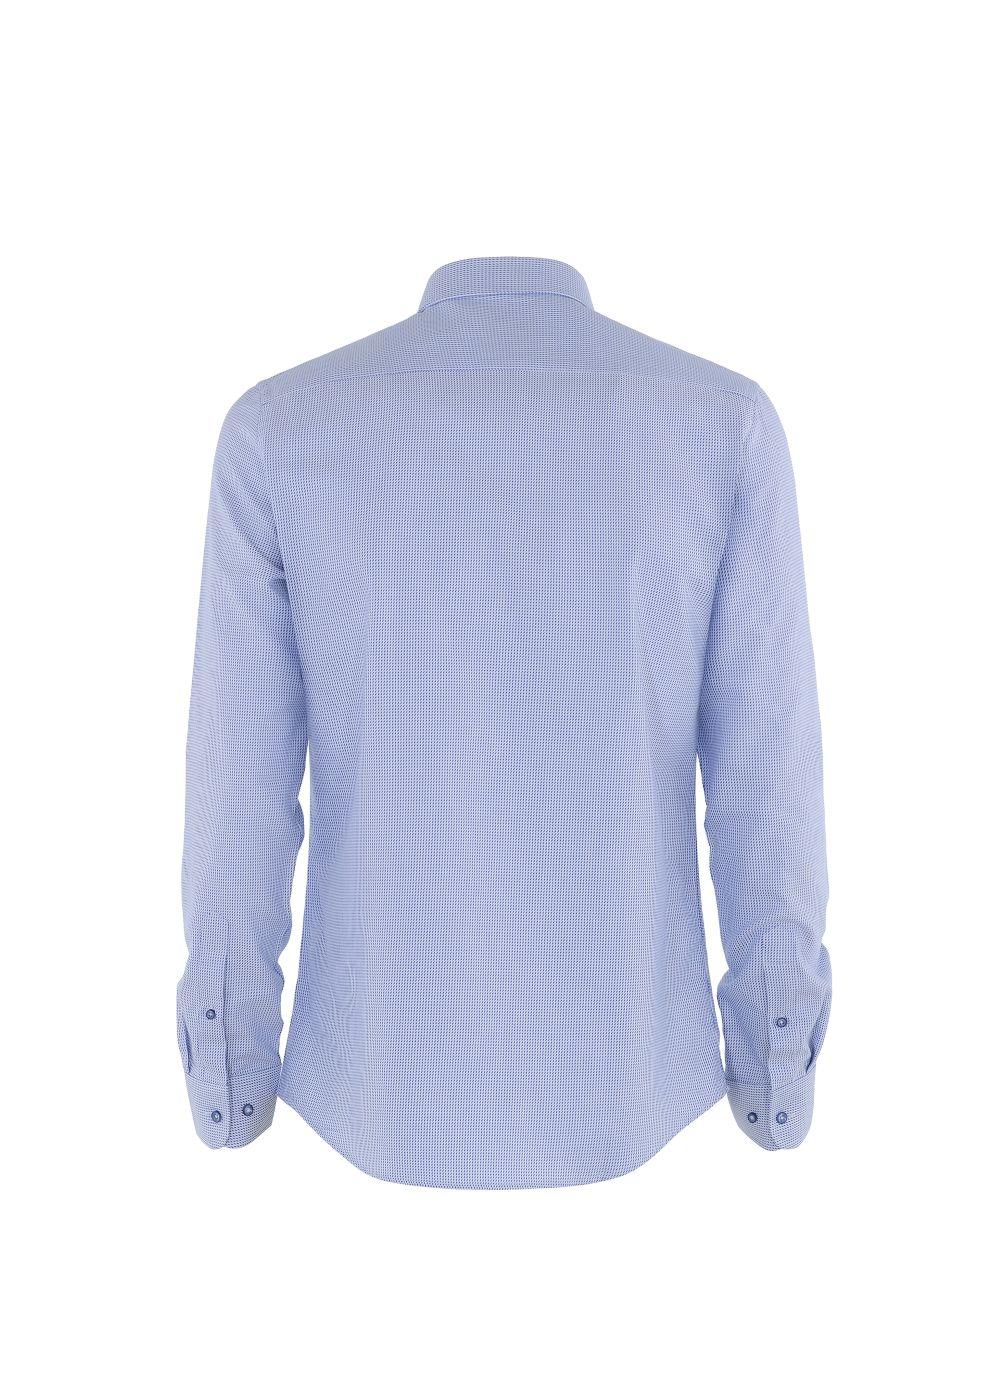 Koszula męska KOSMT-0160-61(Z19)